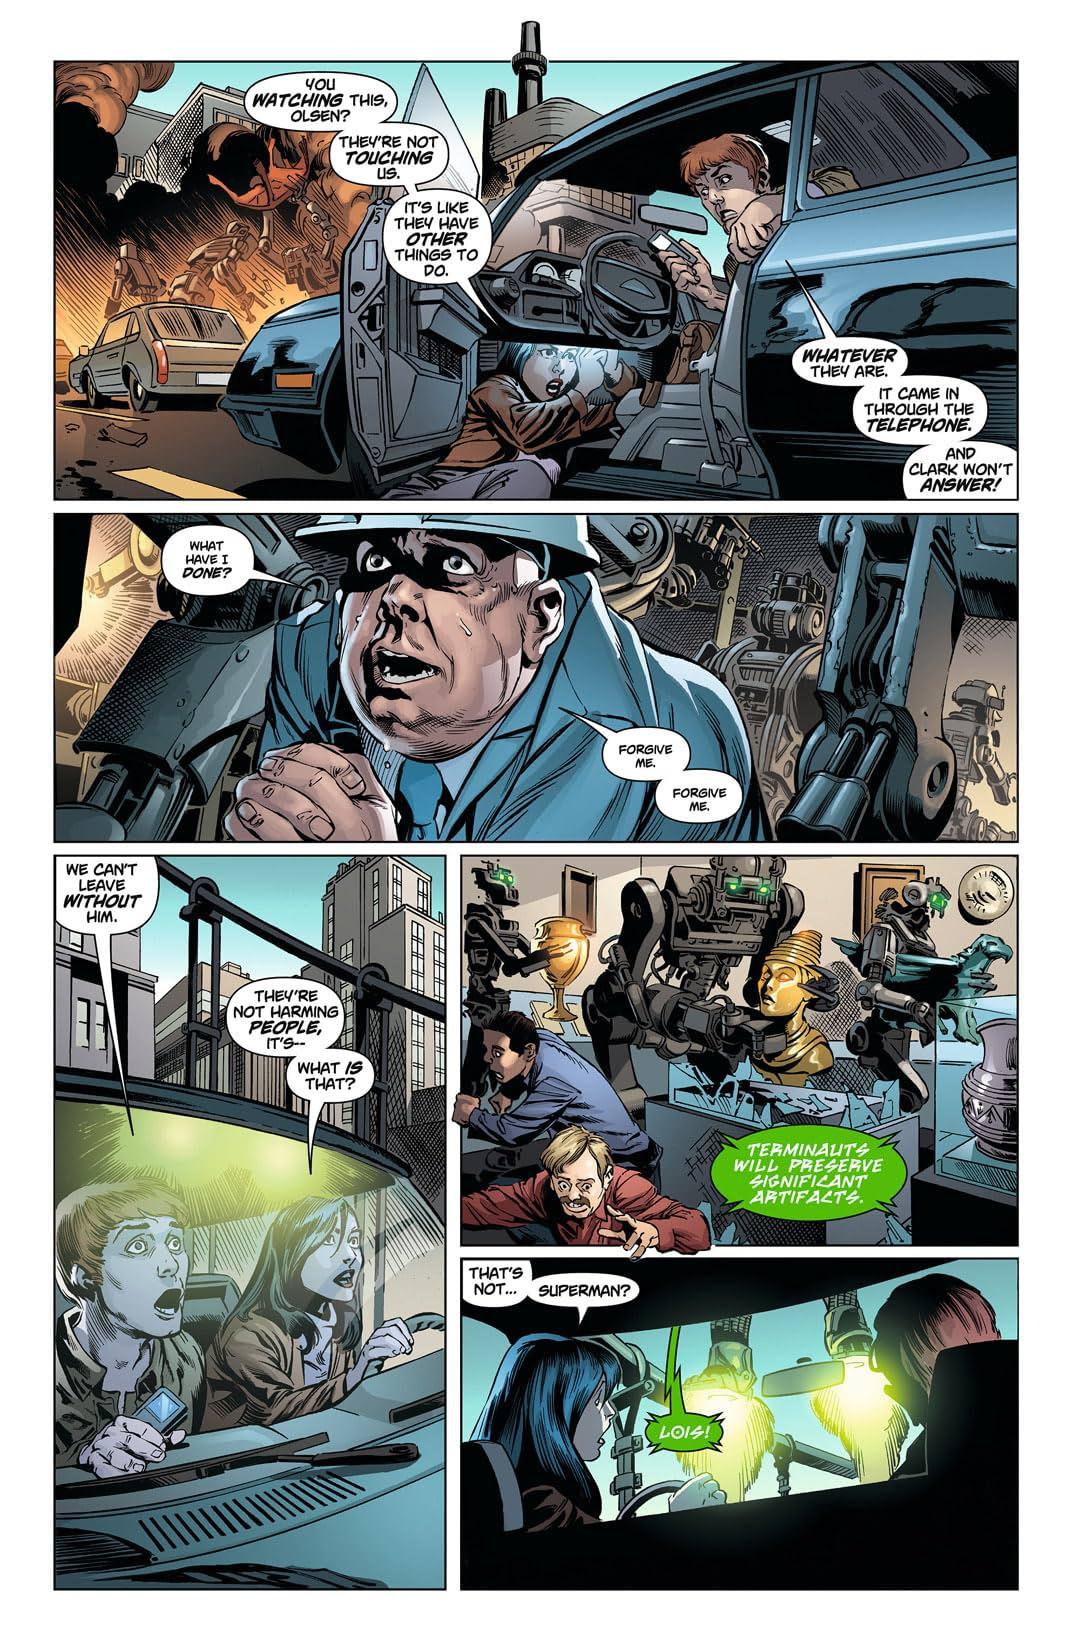 Action Comics (2011-) #4